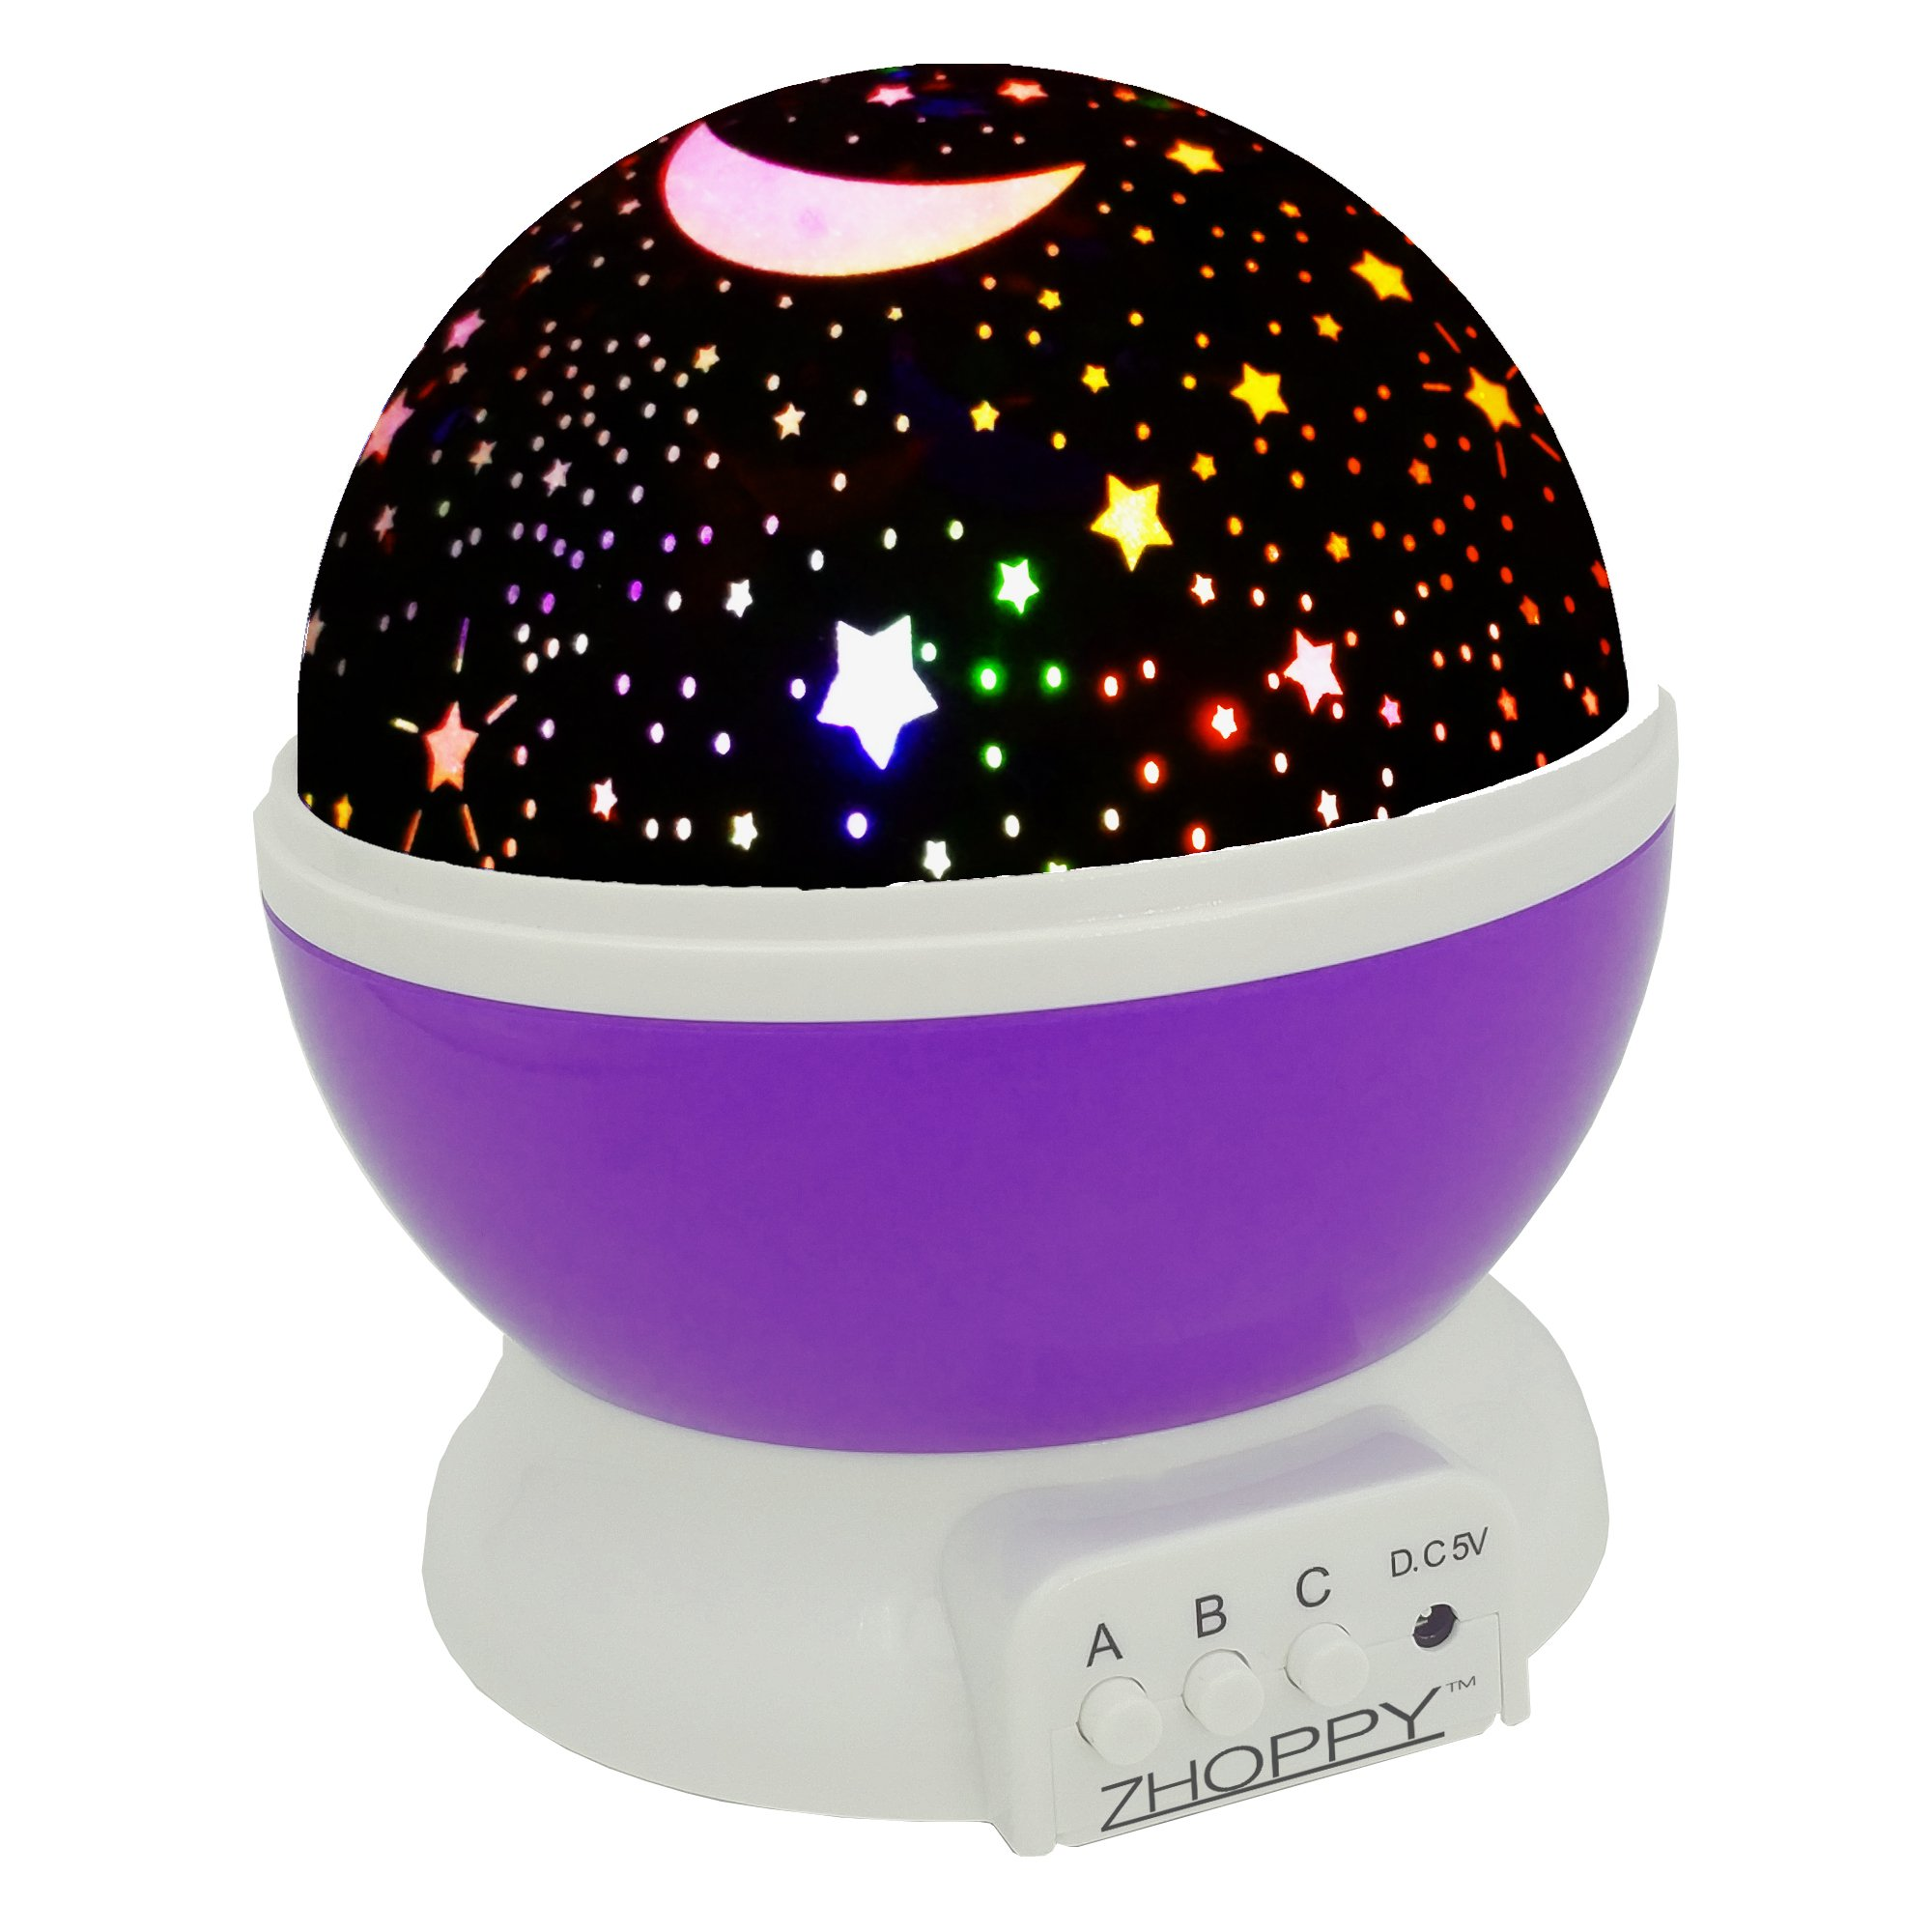 for inspire pink girl black white lamps nursery and baby bedding decor room in inside ba home on lamp elephant pinterest